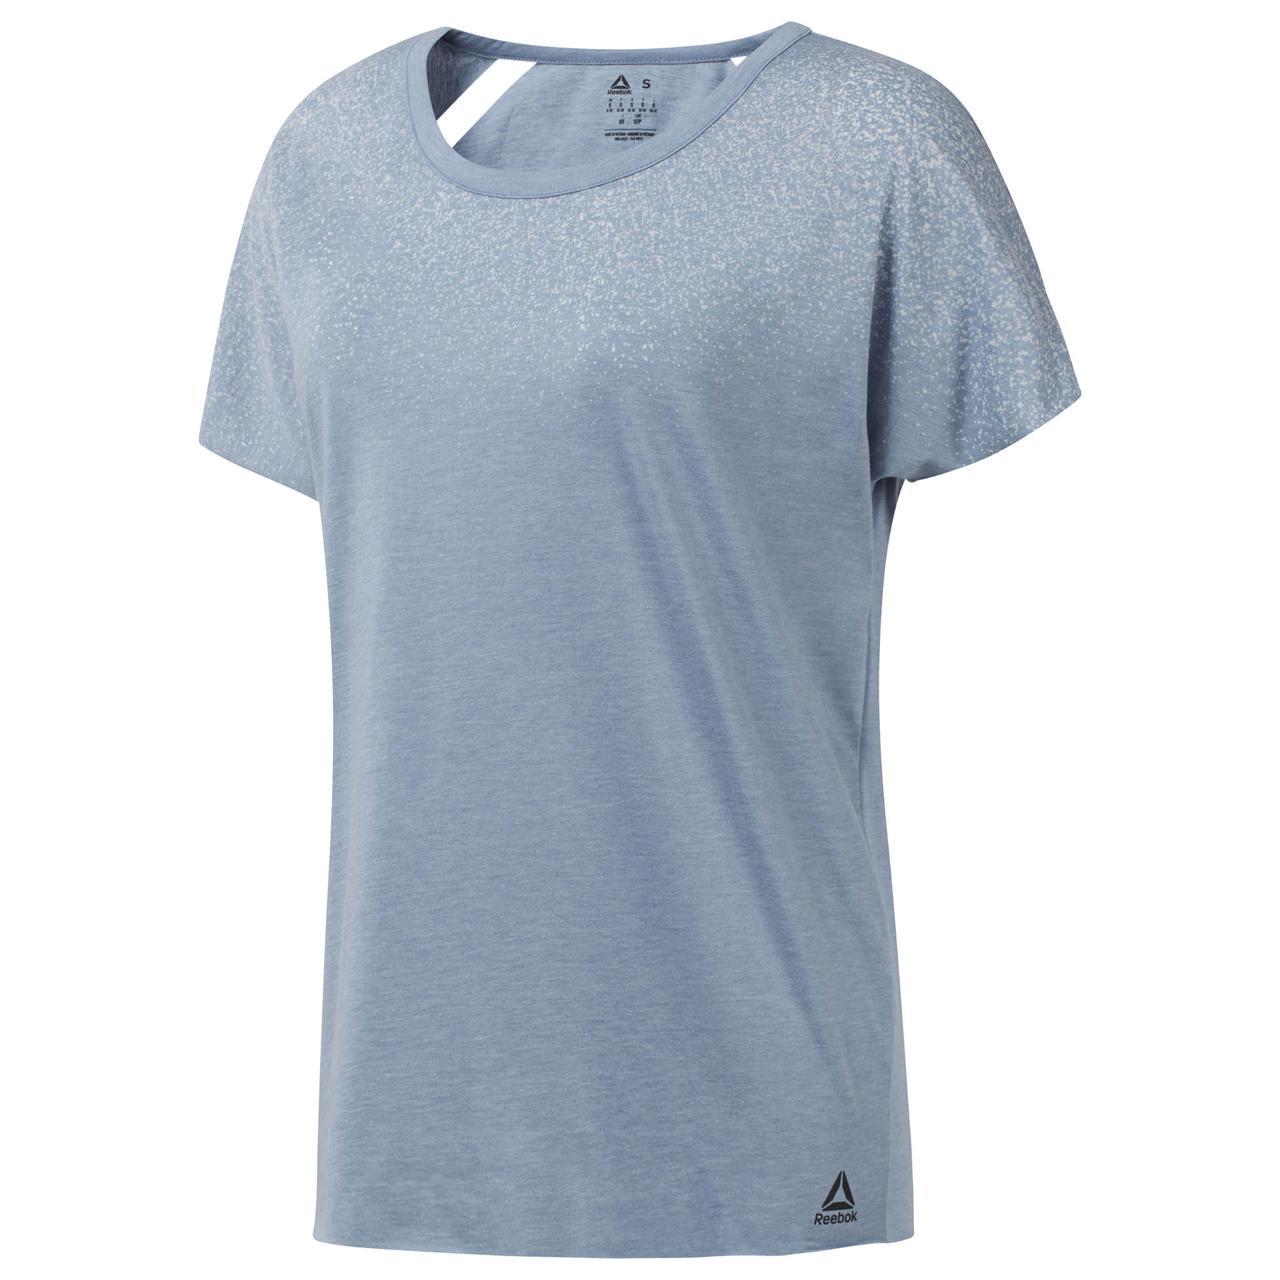 Женская футболка Reebok Distressed (Артикул: CY4930)